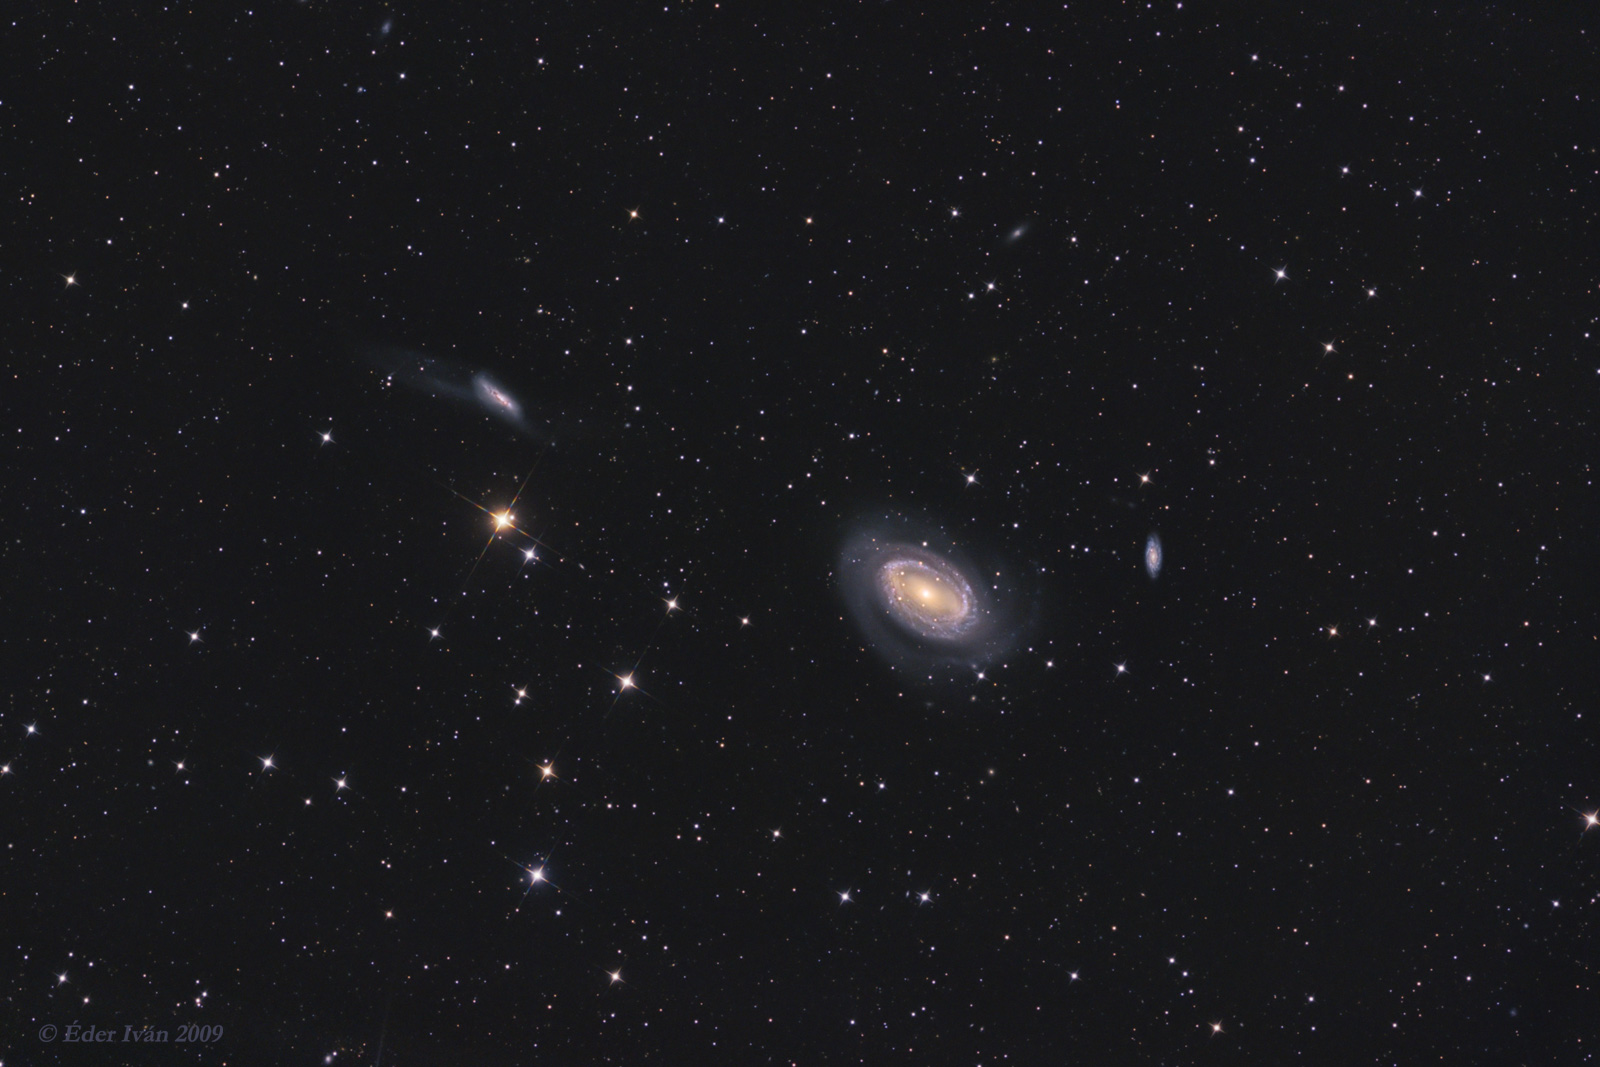 NGC 4725, 4747 and 4712 galaxies